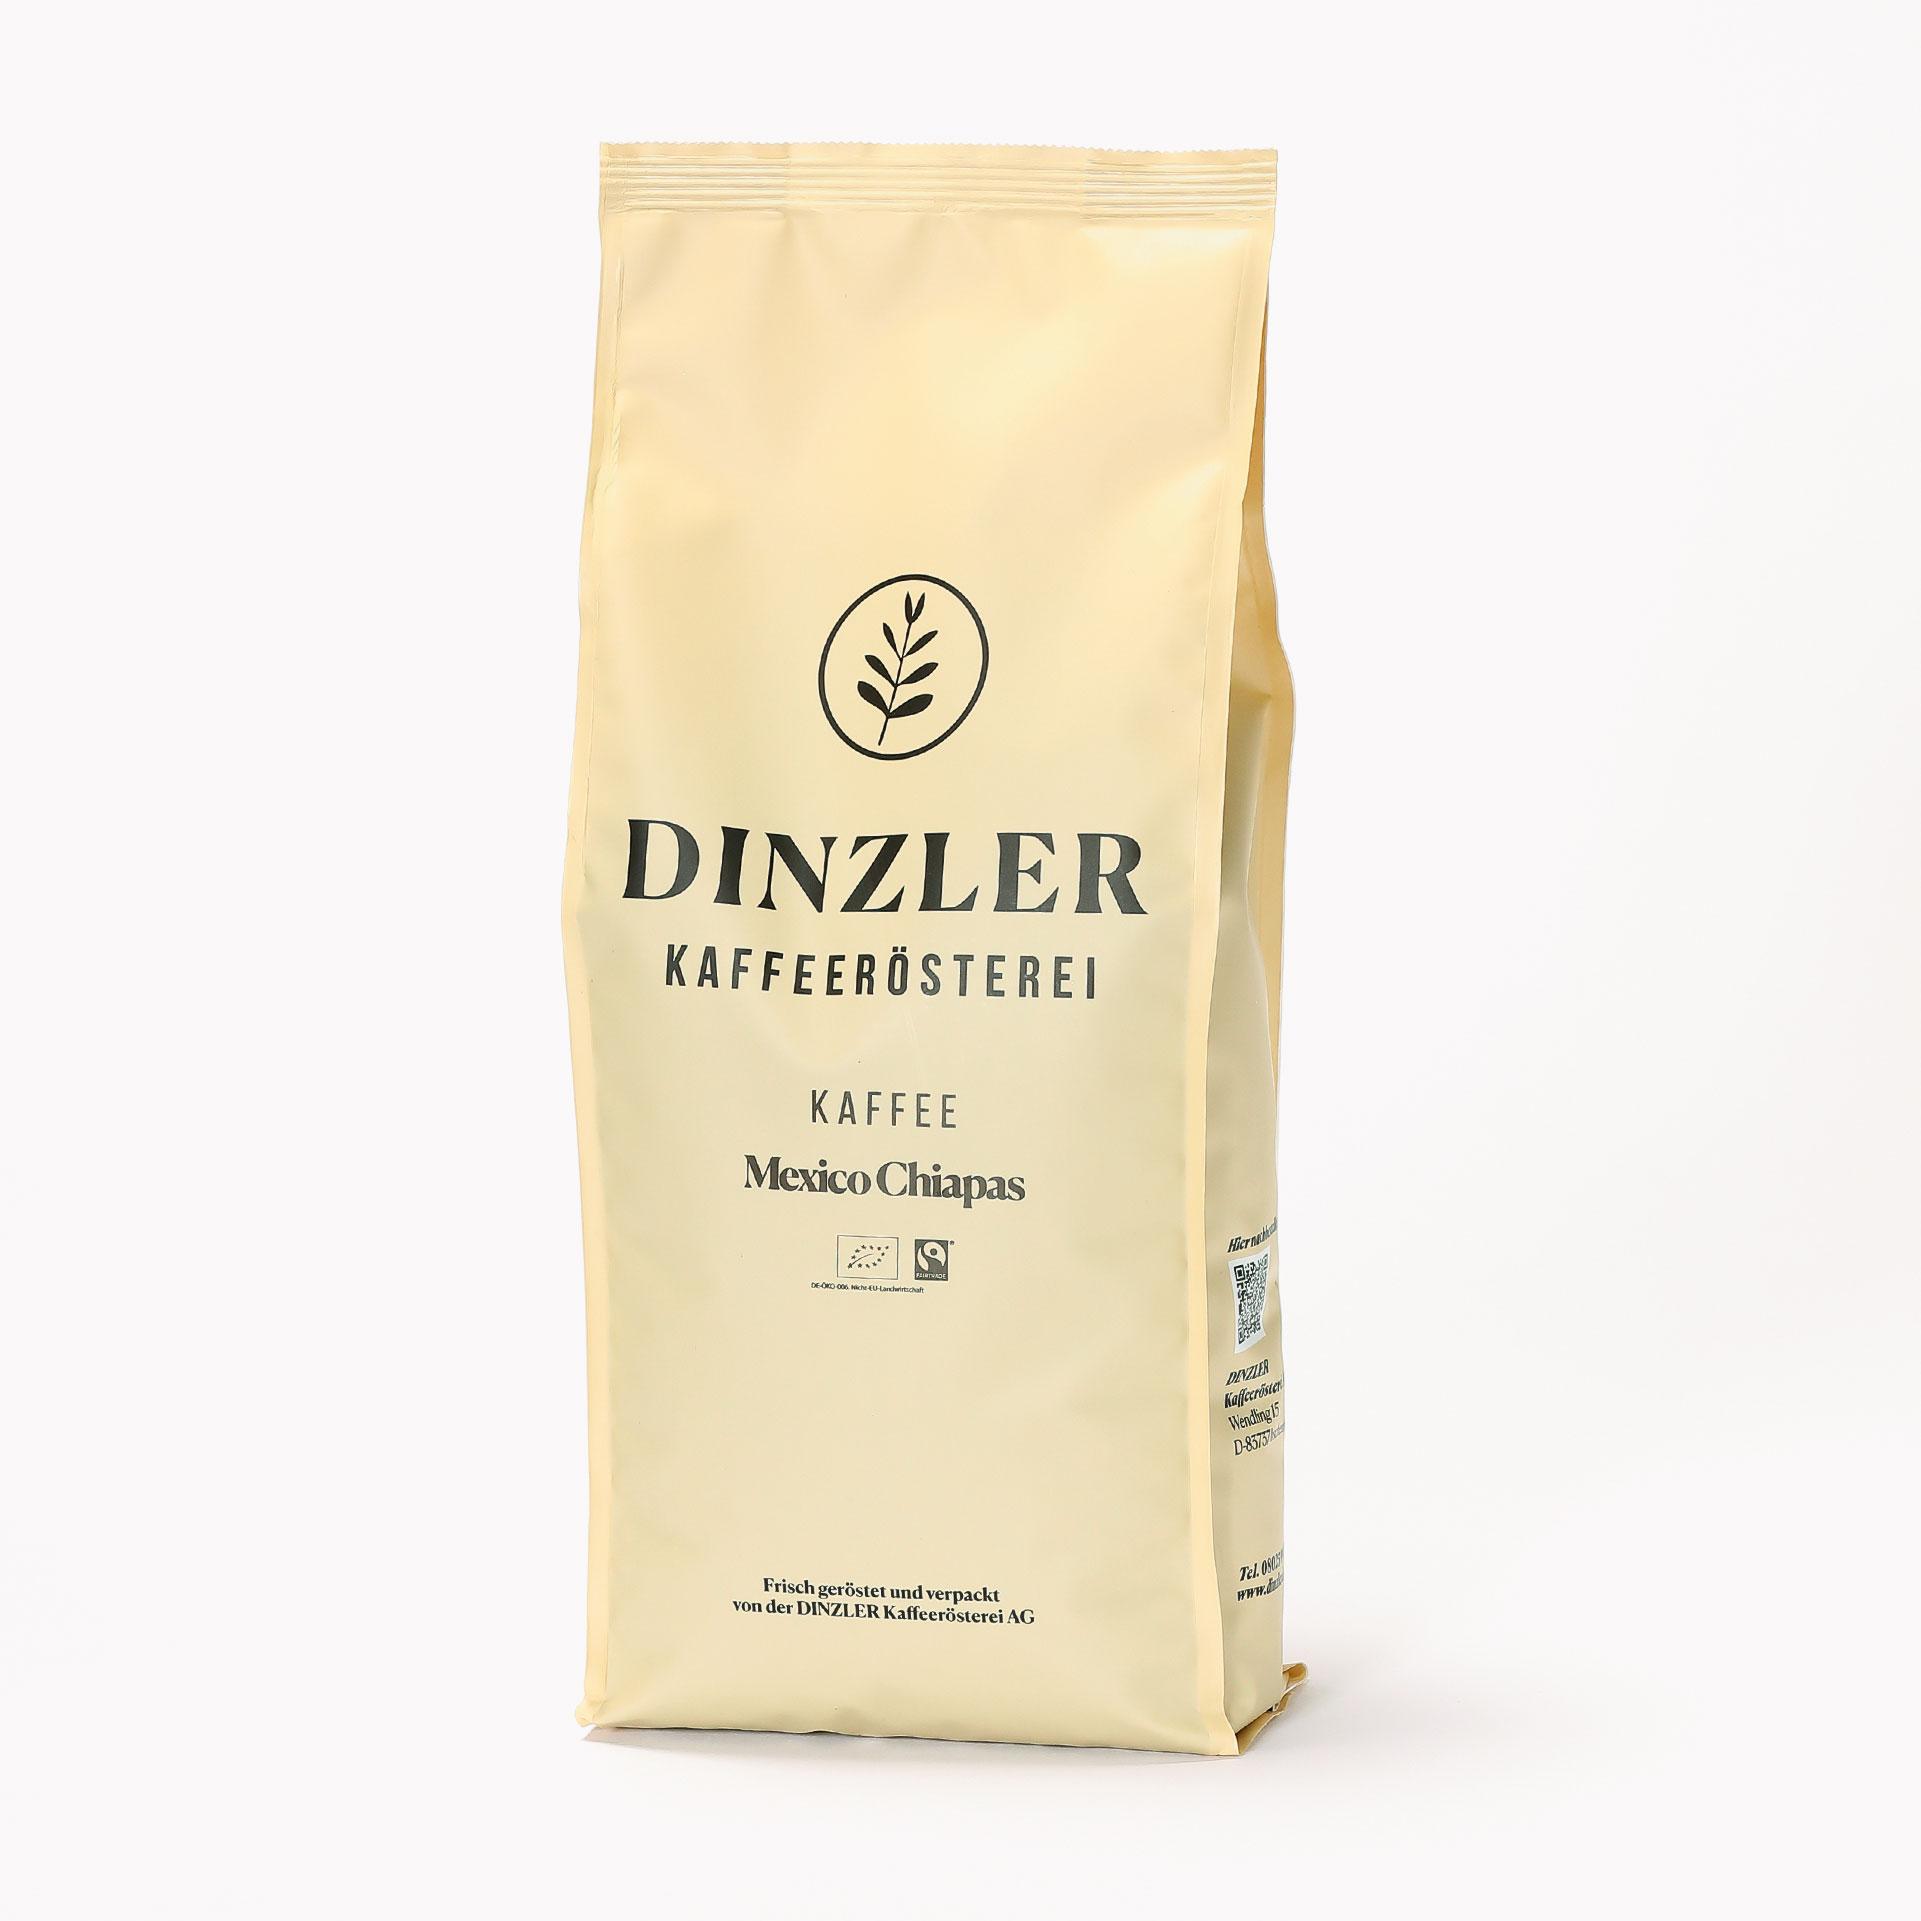 DINZLER Kaffee Mexico Chiapas